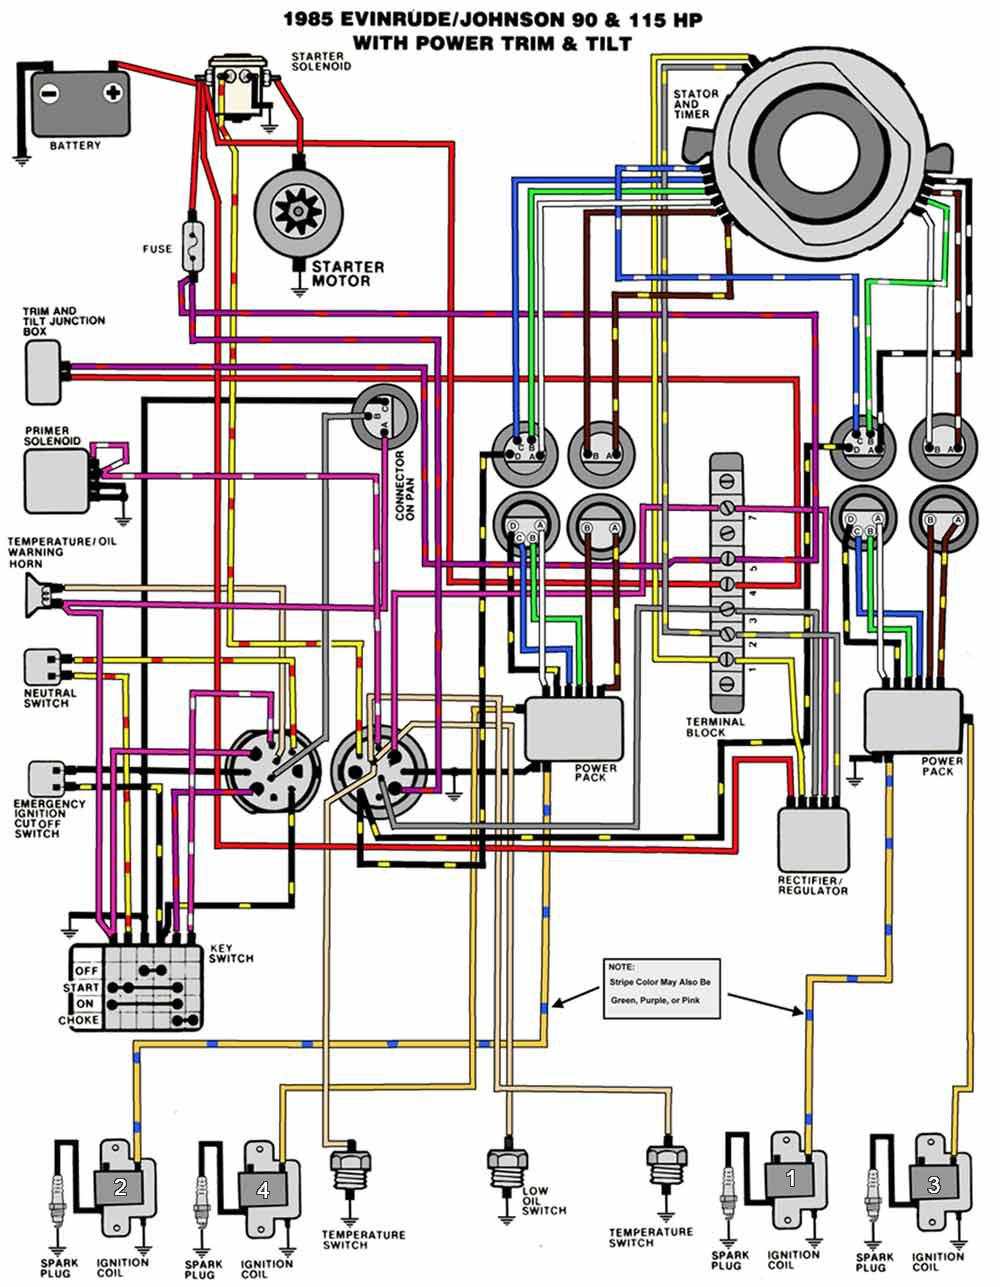 Mercury Outboard Motor Wiring Harness 115 Hp: 115 Johnson Trim Motor Wiring Diagram At Satuska.co